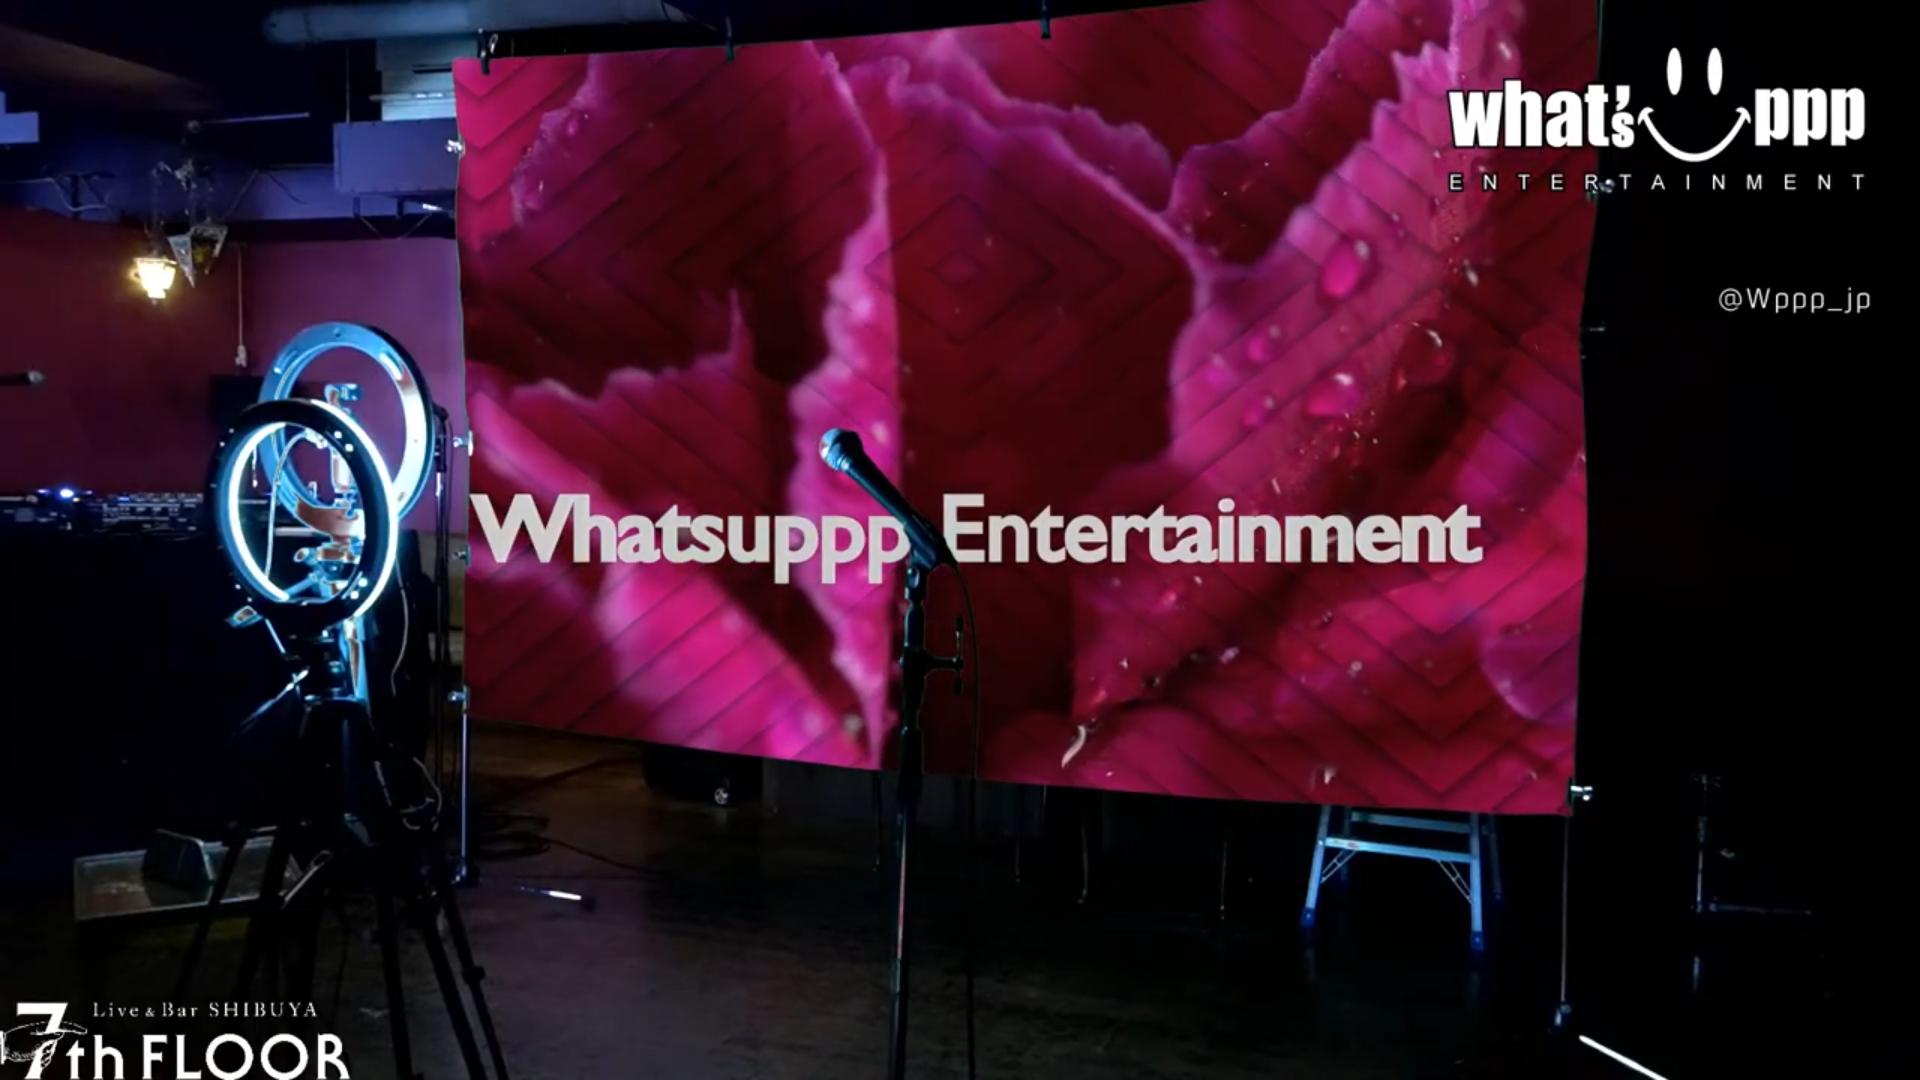 What'suppp オフィシャルイベント「communicate」オンラインライブ動画(編集版)